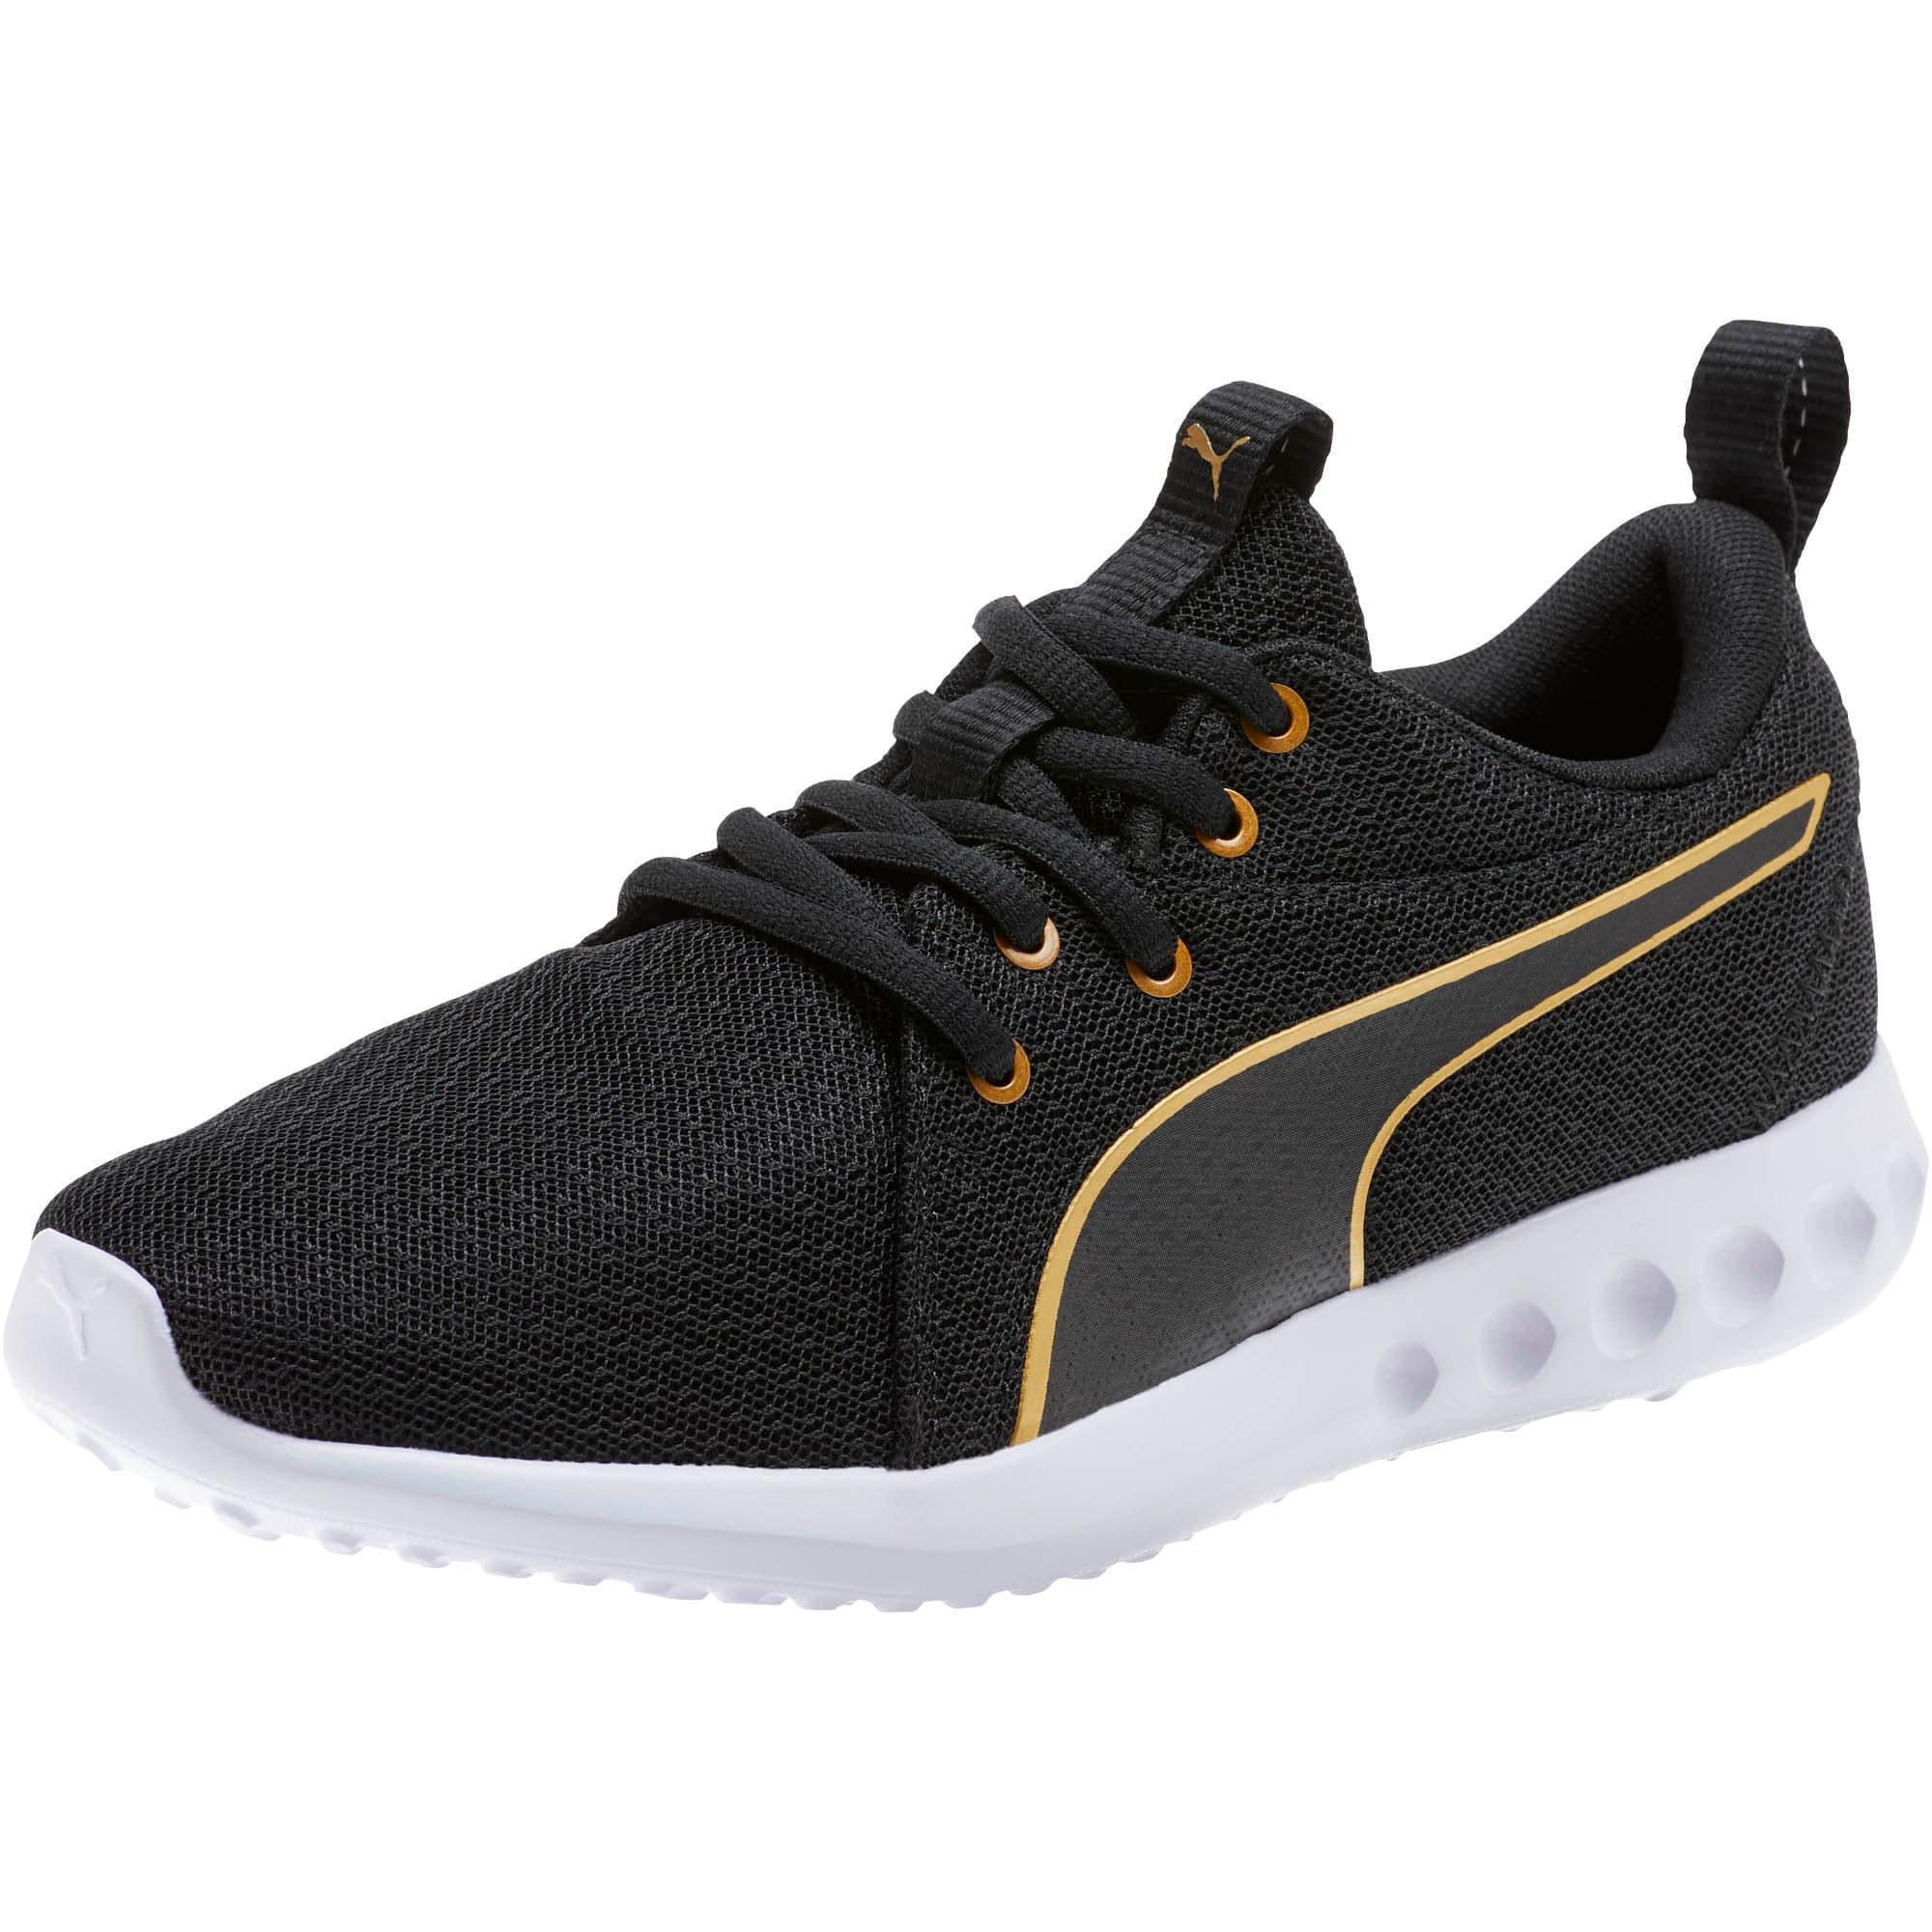 Thumbnail 1 of Carson 2 Metallic Mesh Shoes JR, Puma Black-Gold, medium